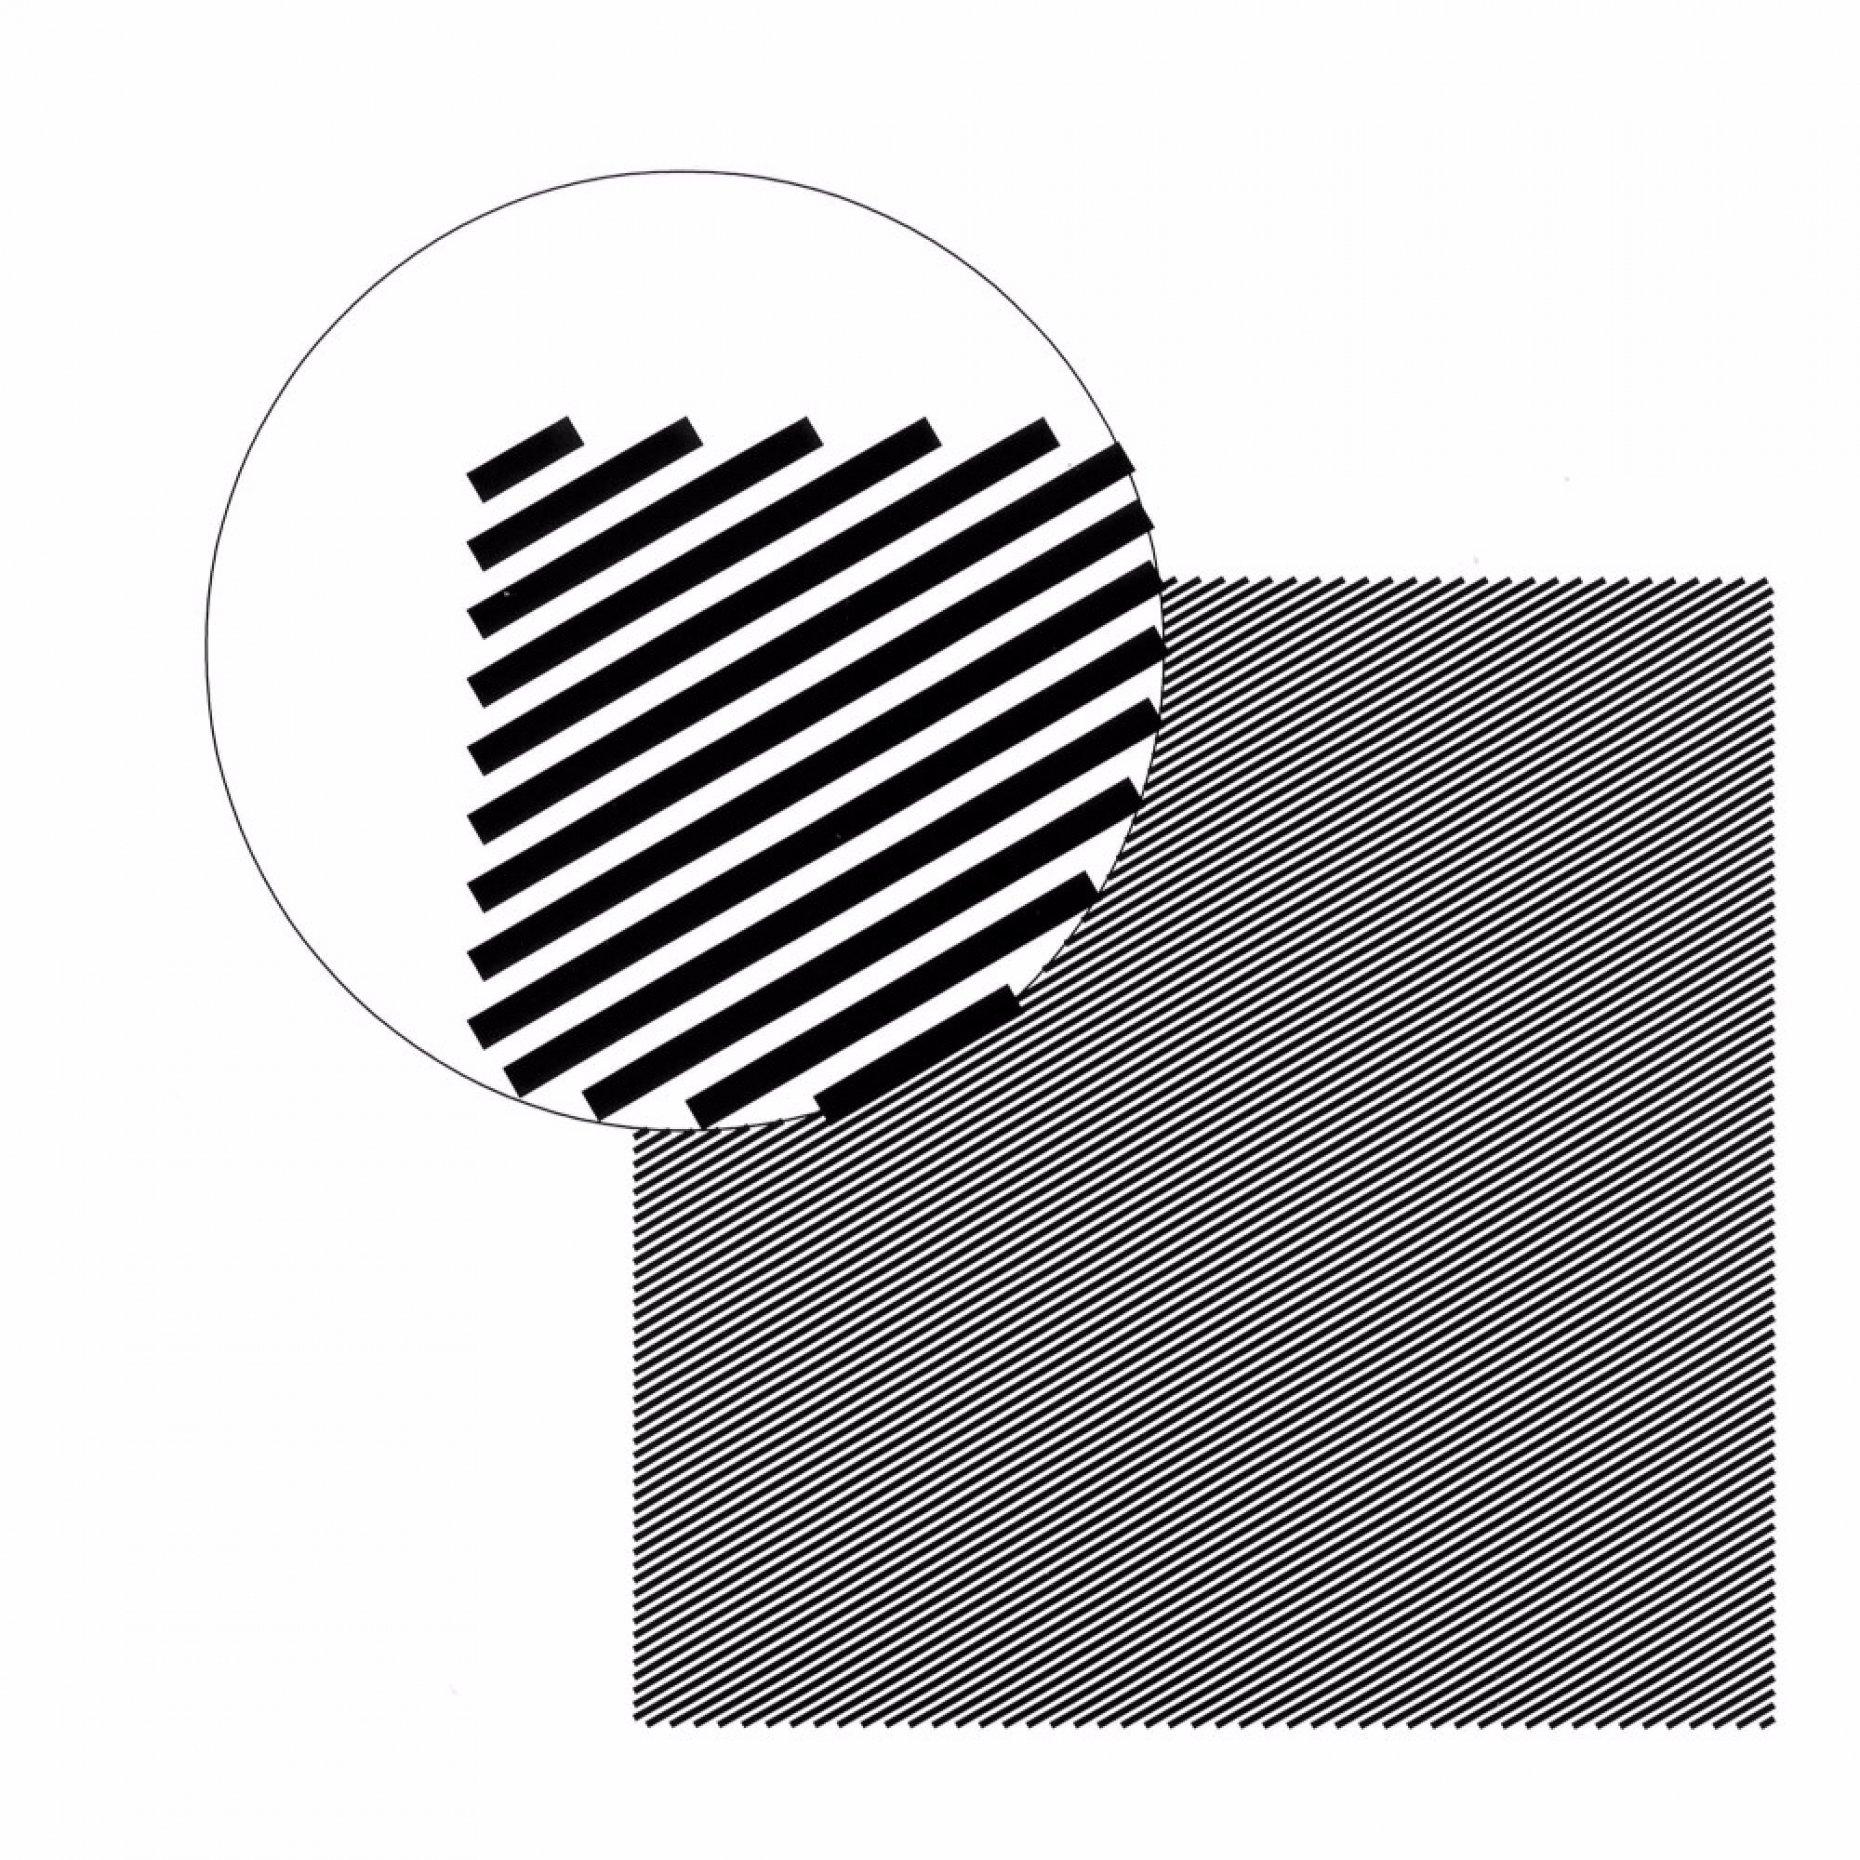 ATS03 30º 12mm Lines Pattern